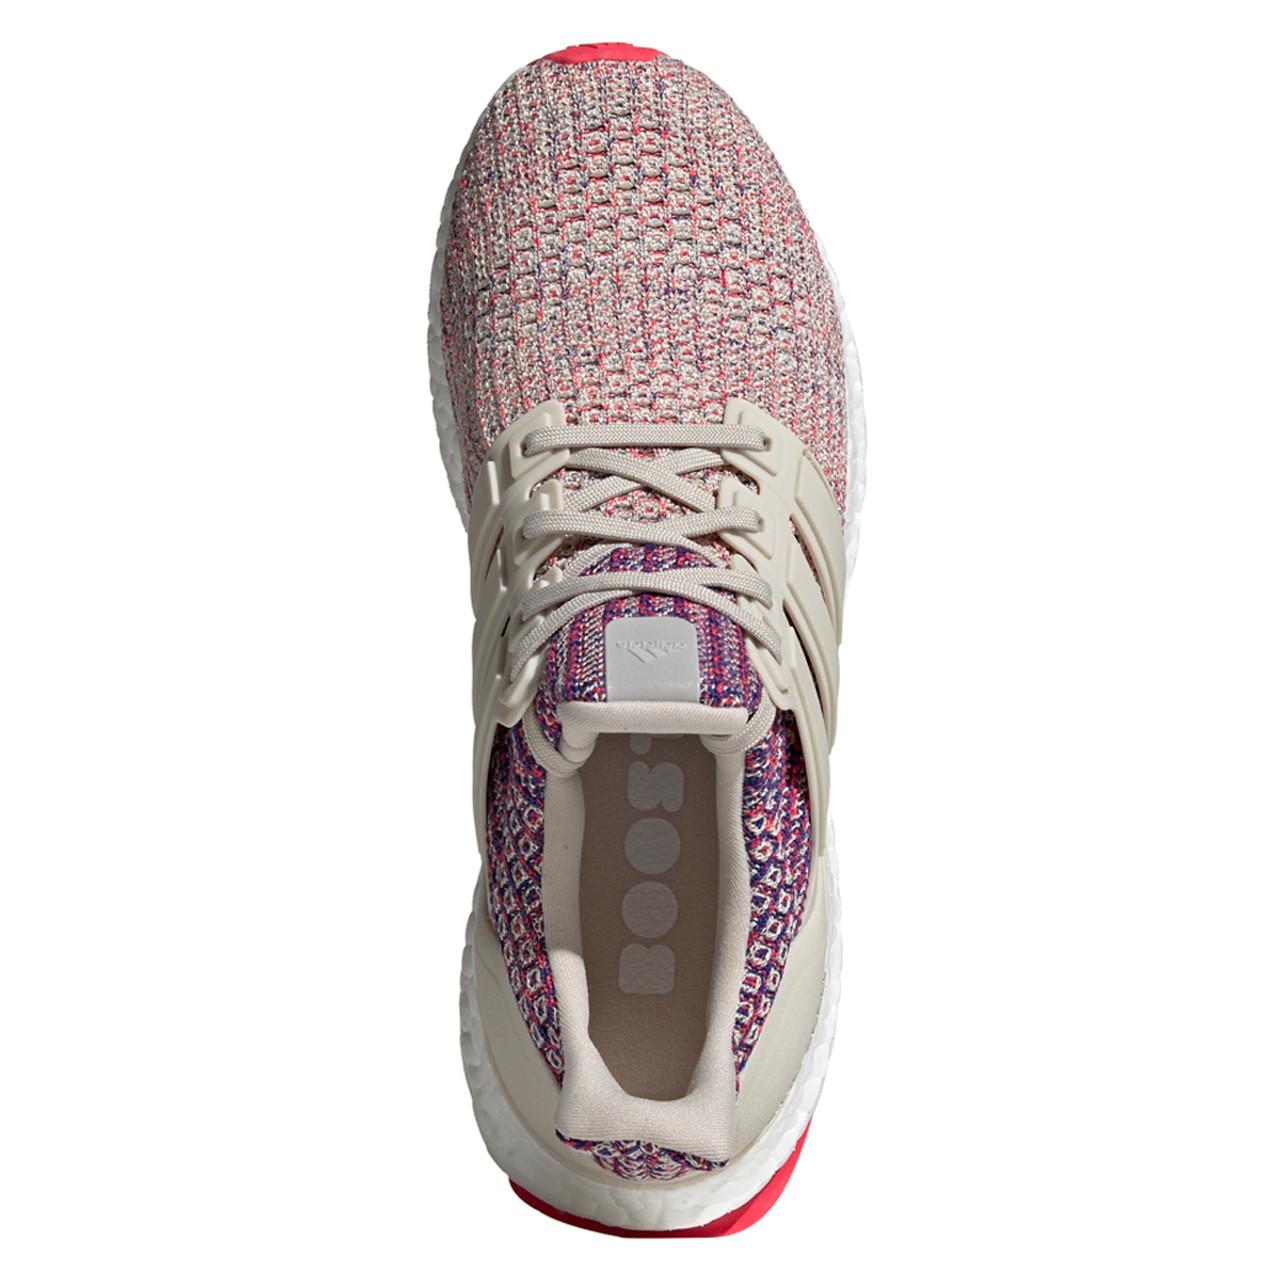 1d6a6de45653f Adidas UltraBoost Women s Running Sneakers F36122 - Multi Colored ...